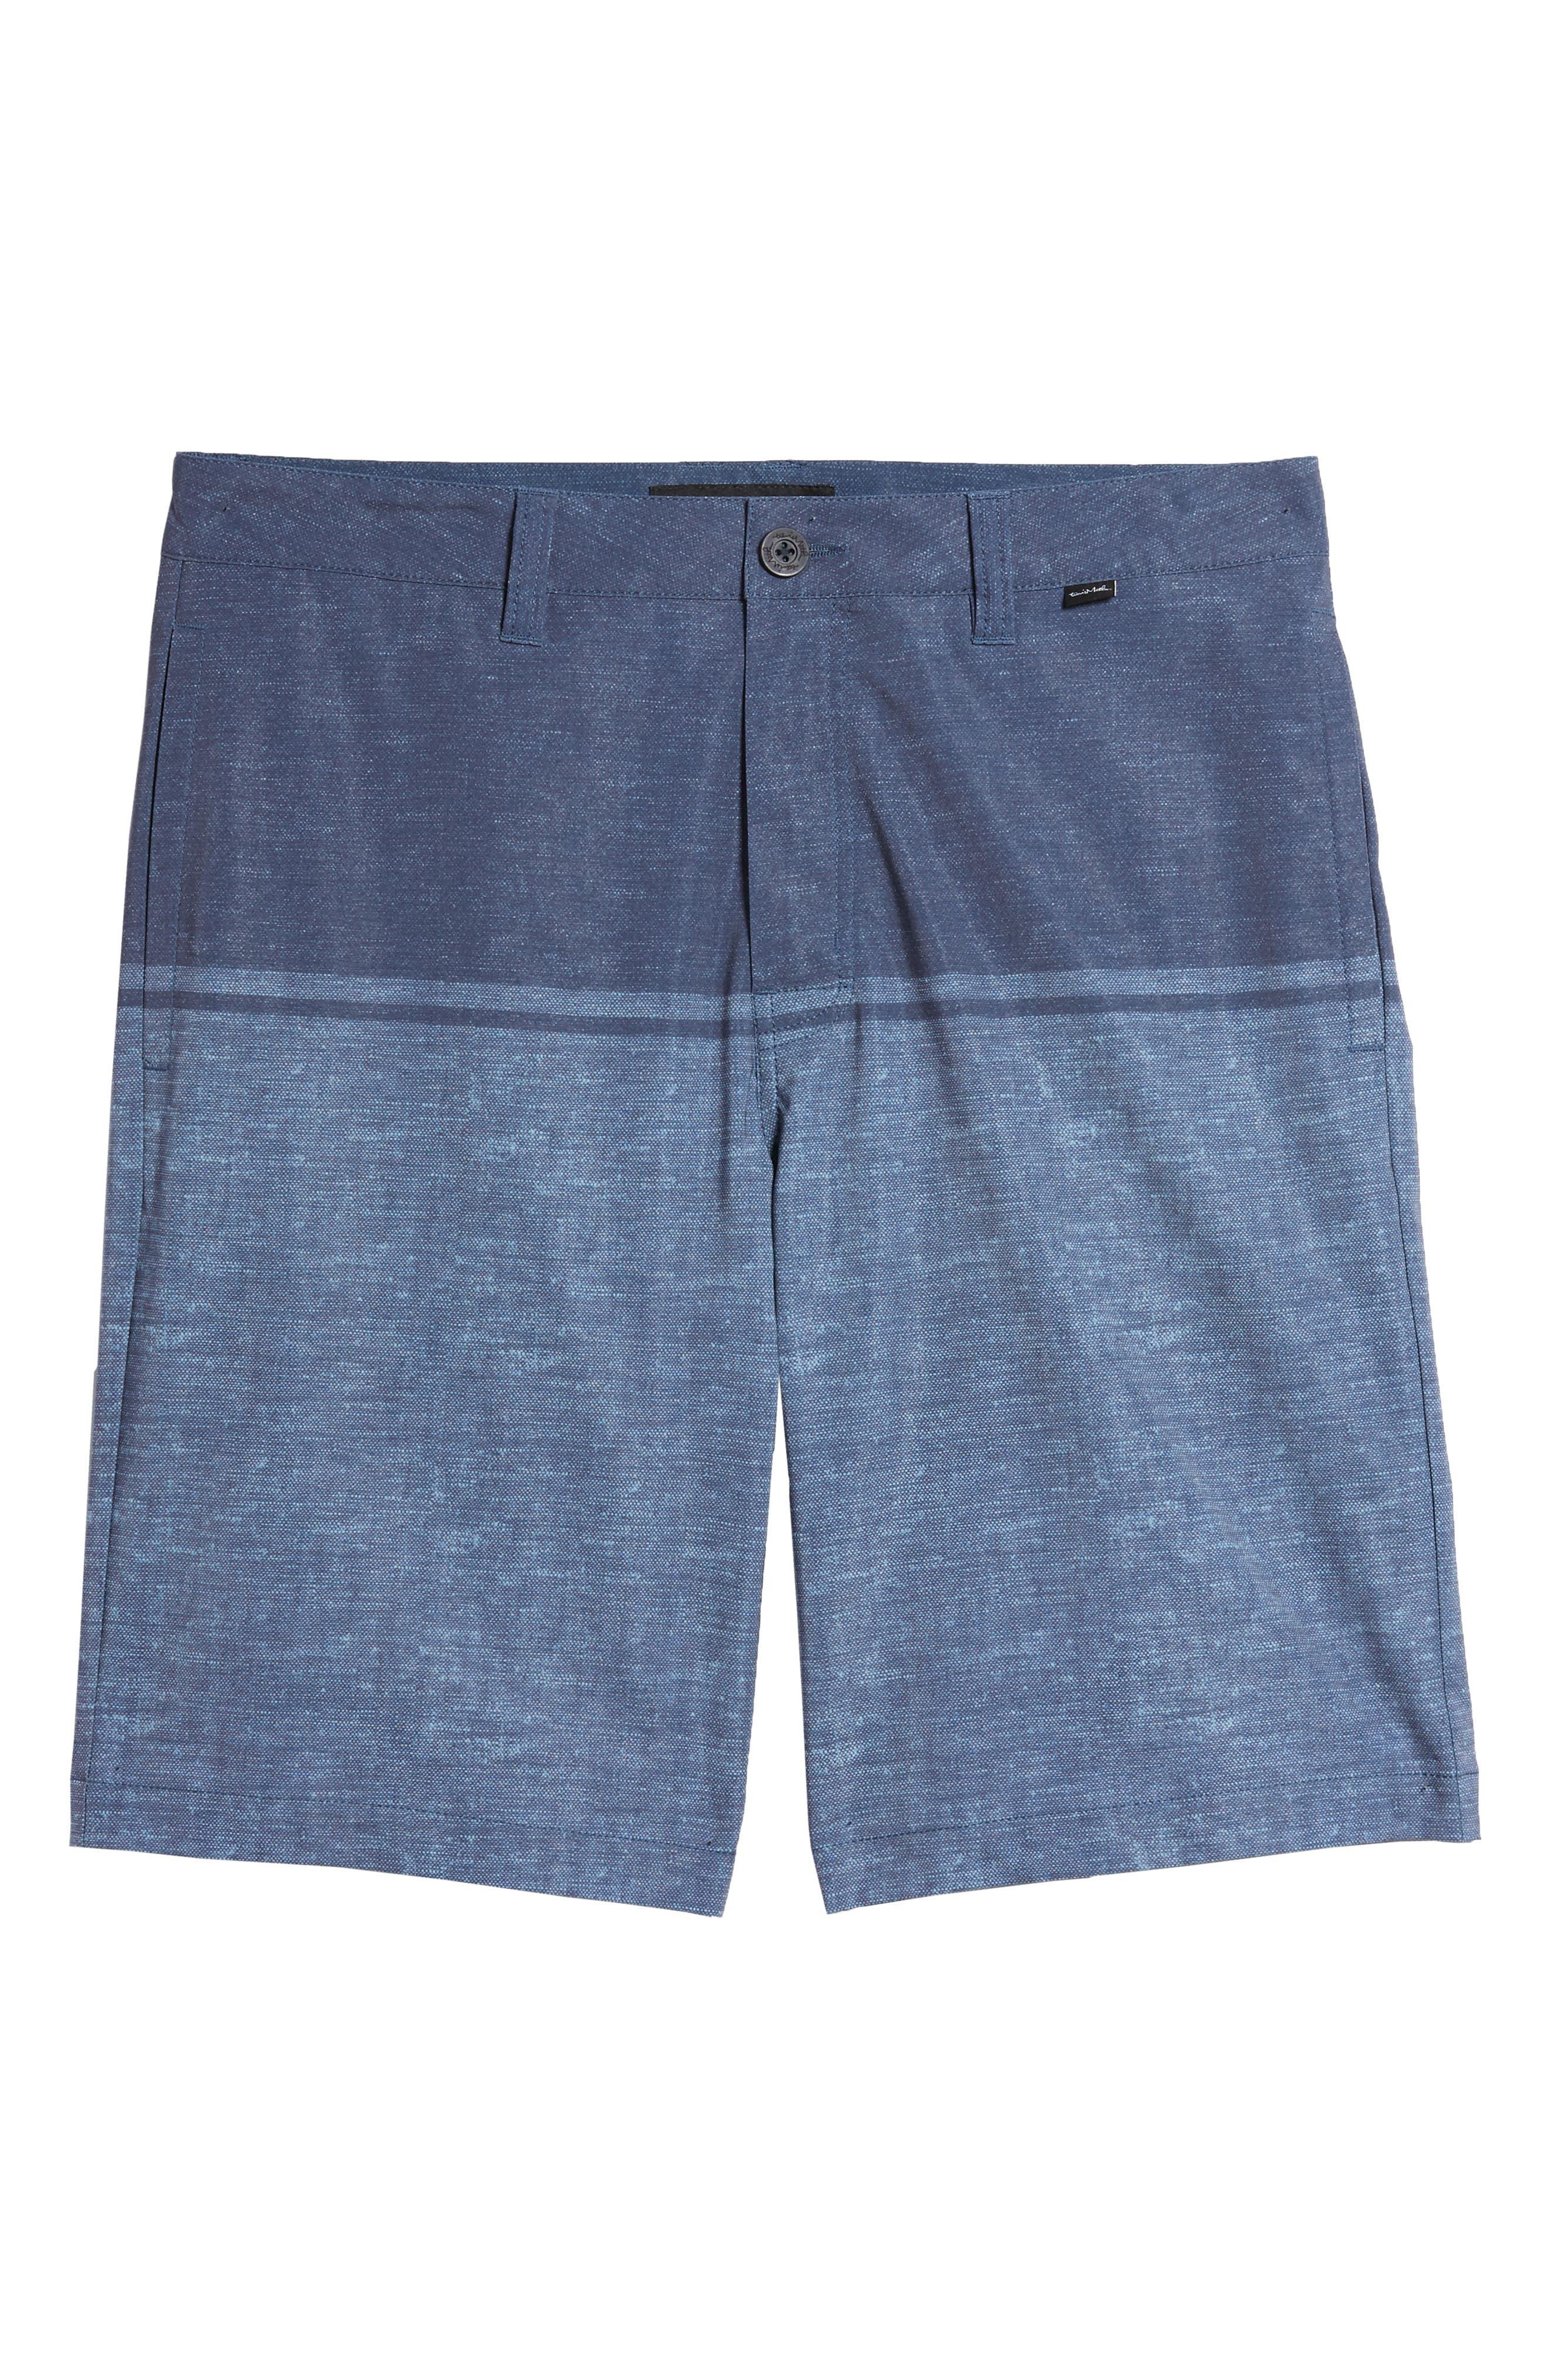 Peale Hybrid Shorts,                             Alternate thumbnail 12, color,